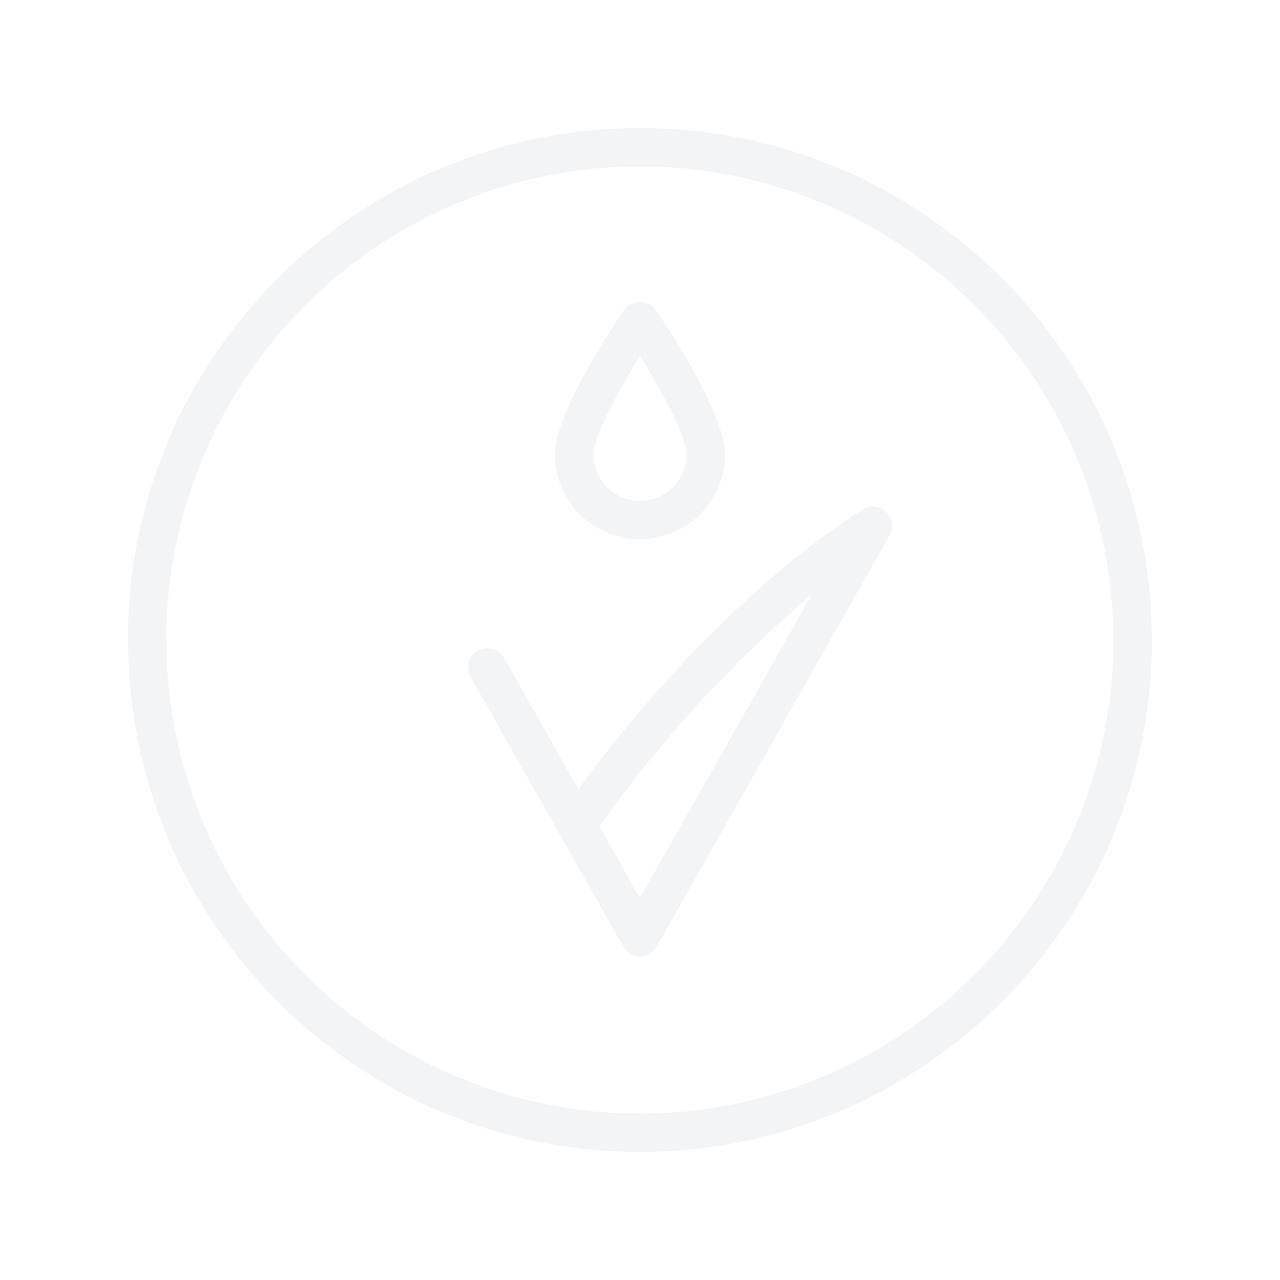 LA ROCHE-POSAY Substiane Replenishing Care (Dry/Very Dry Skin) 40ml